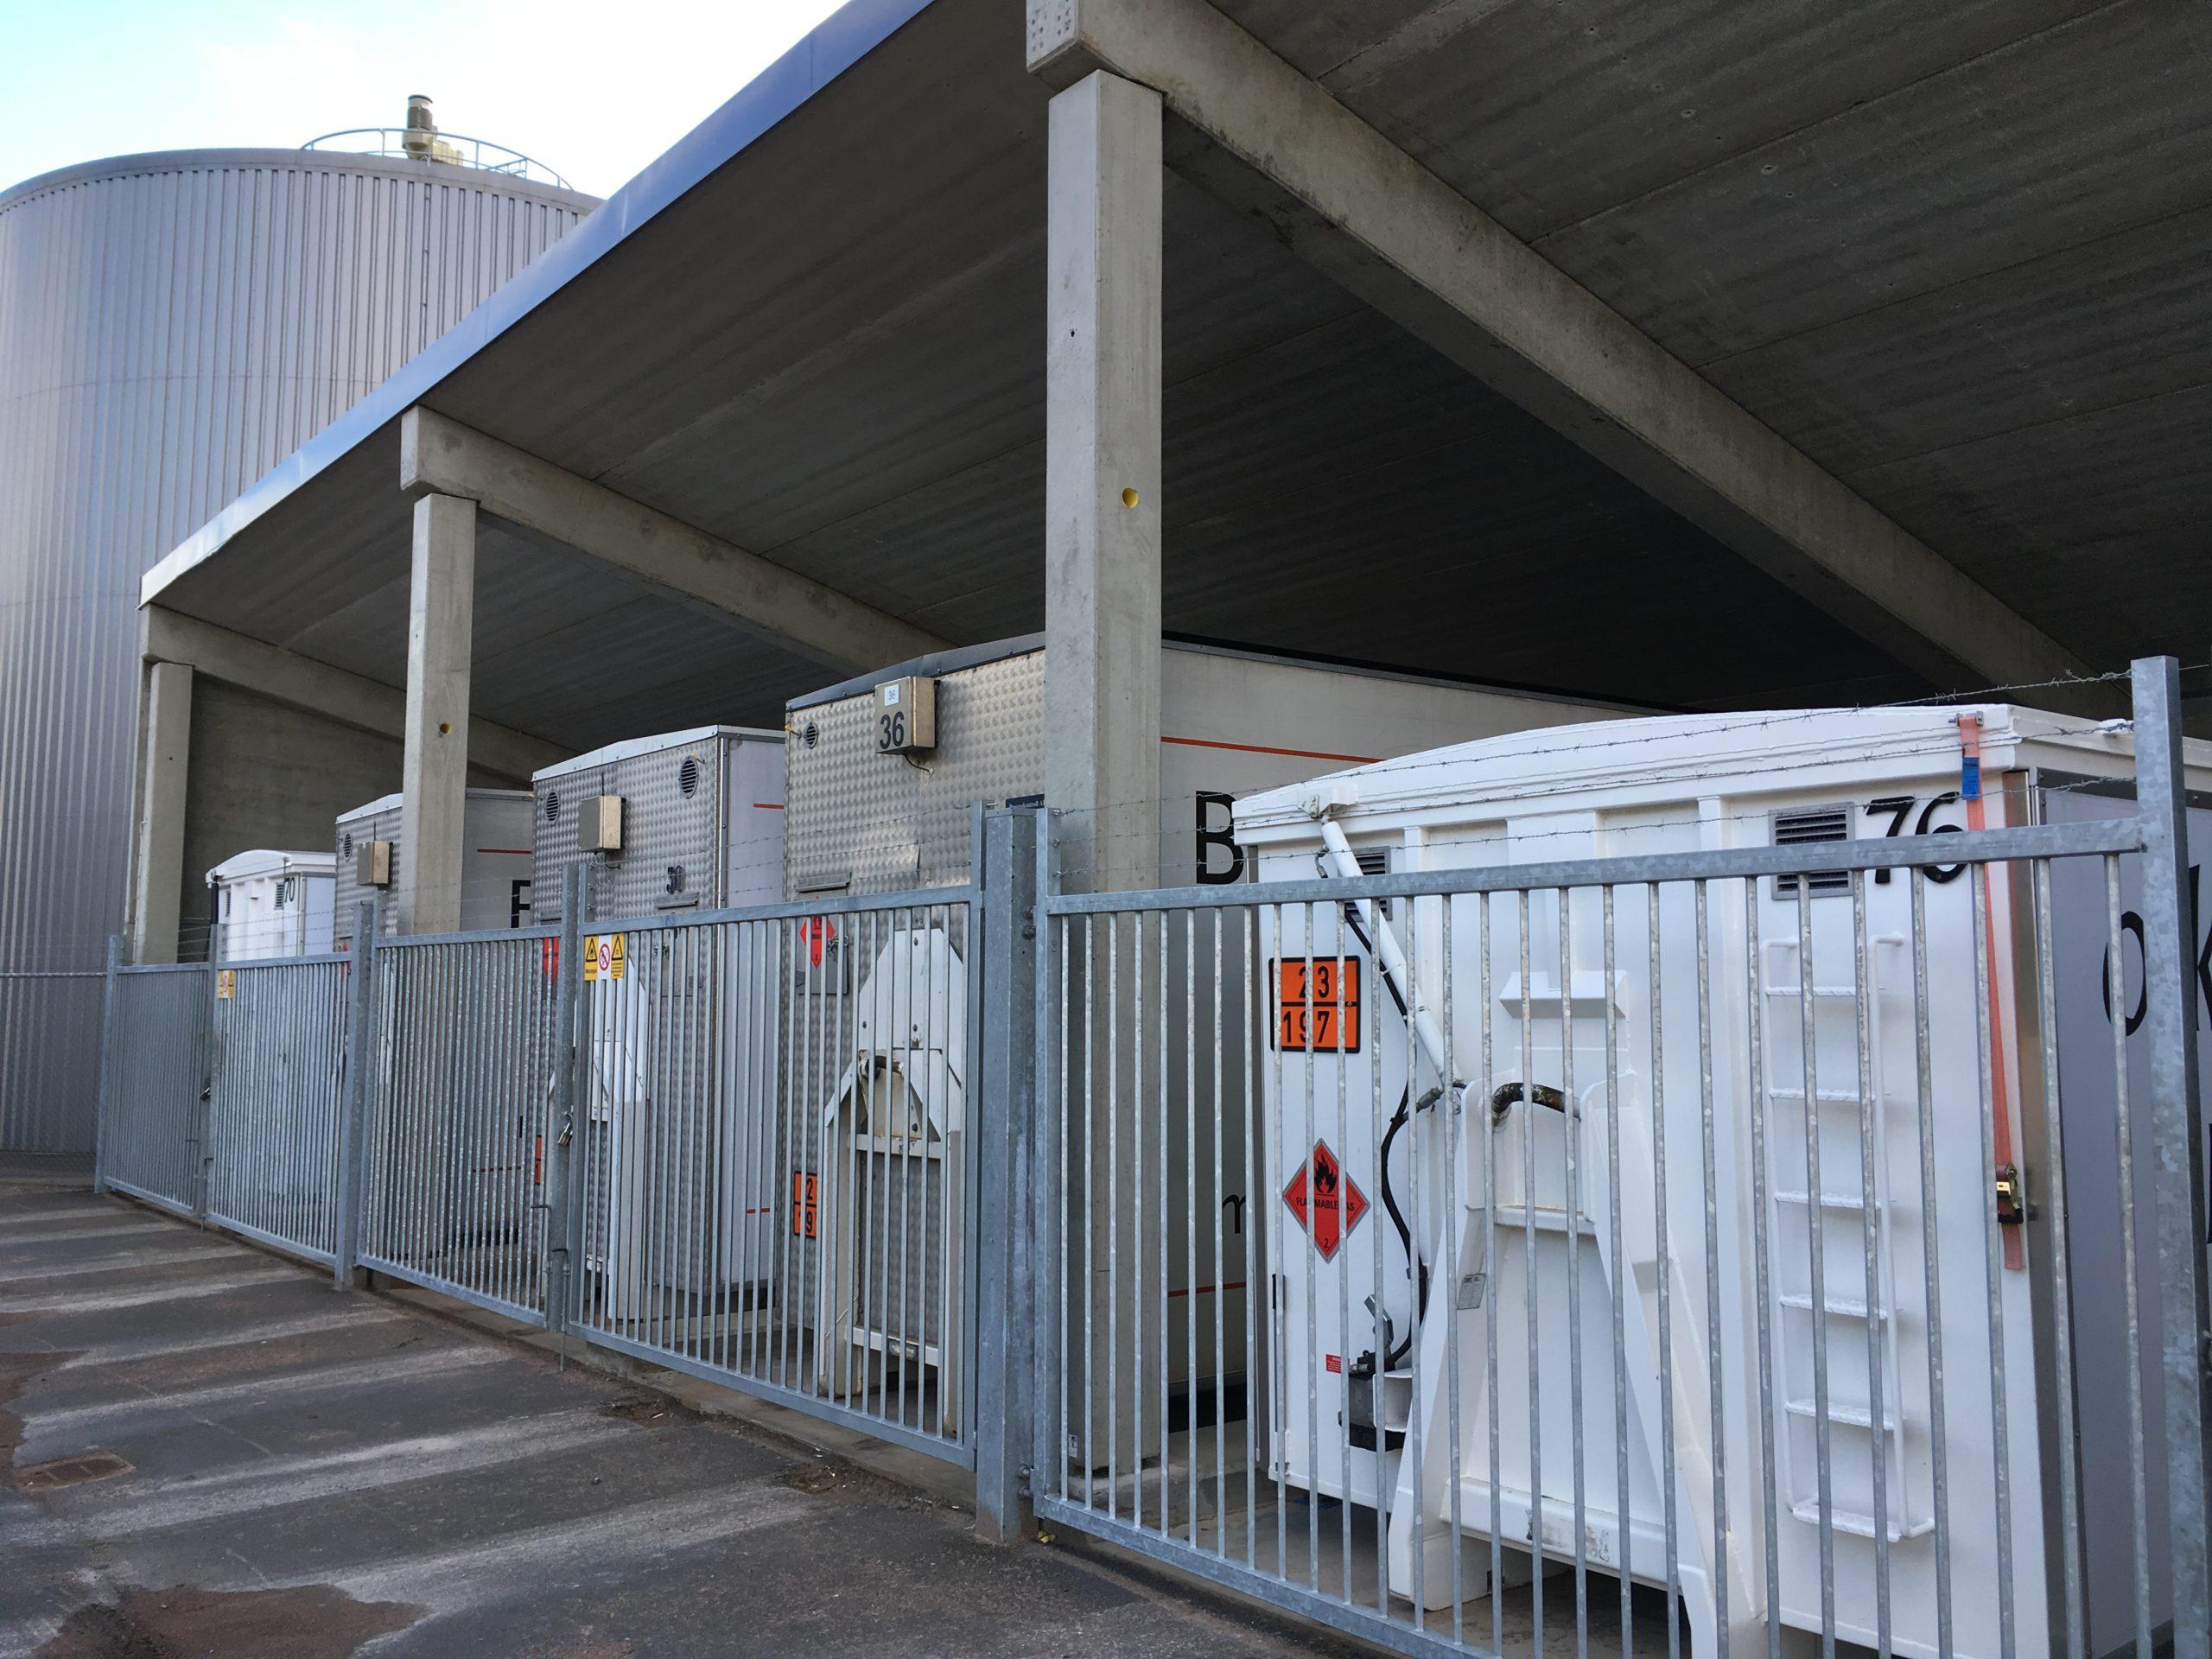 MEMBER'S PRESS RELEASE: Europe Needs More Biogas